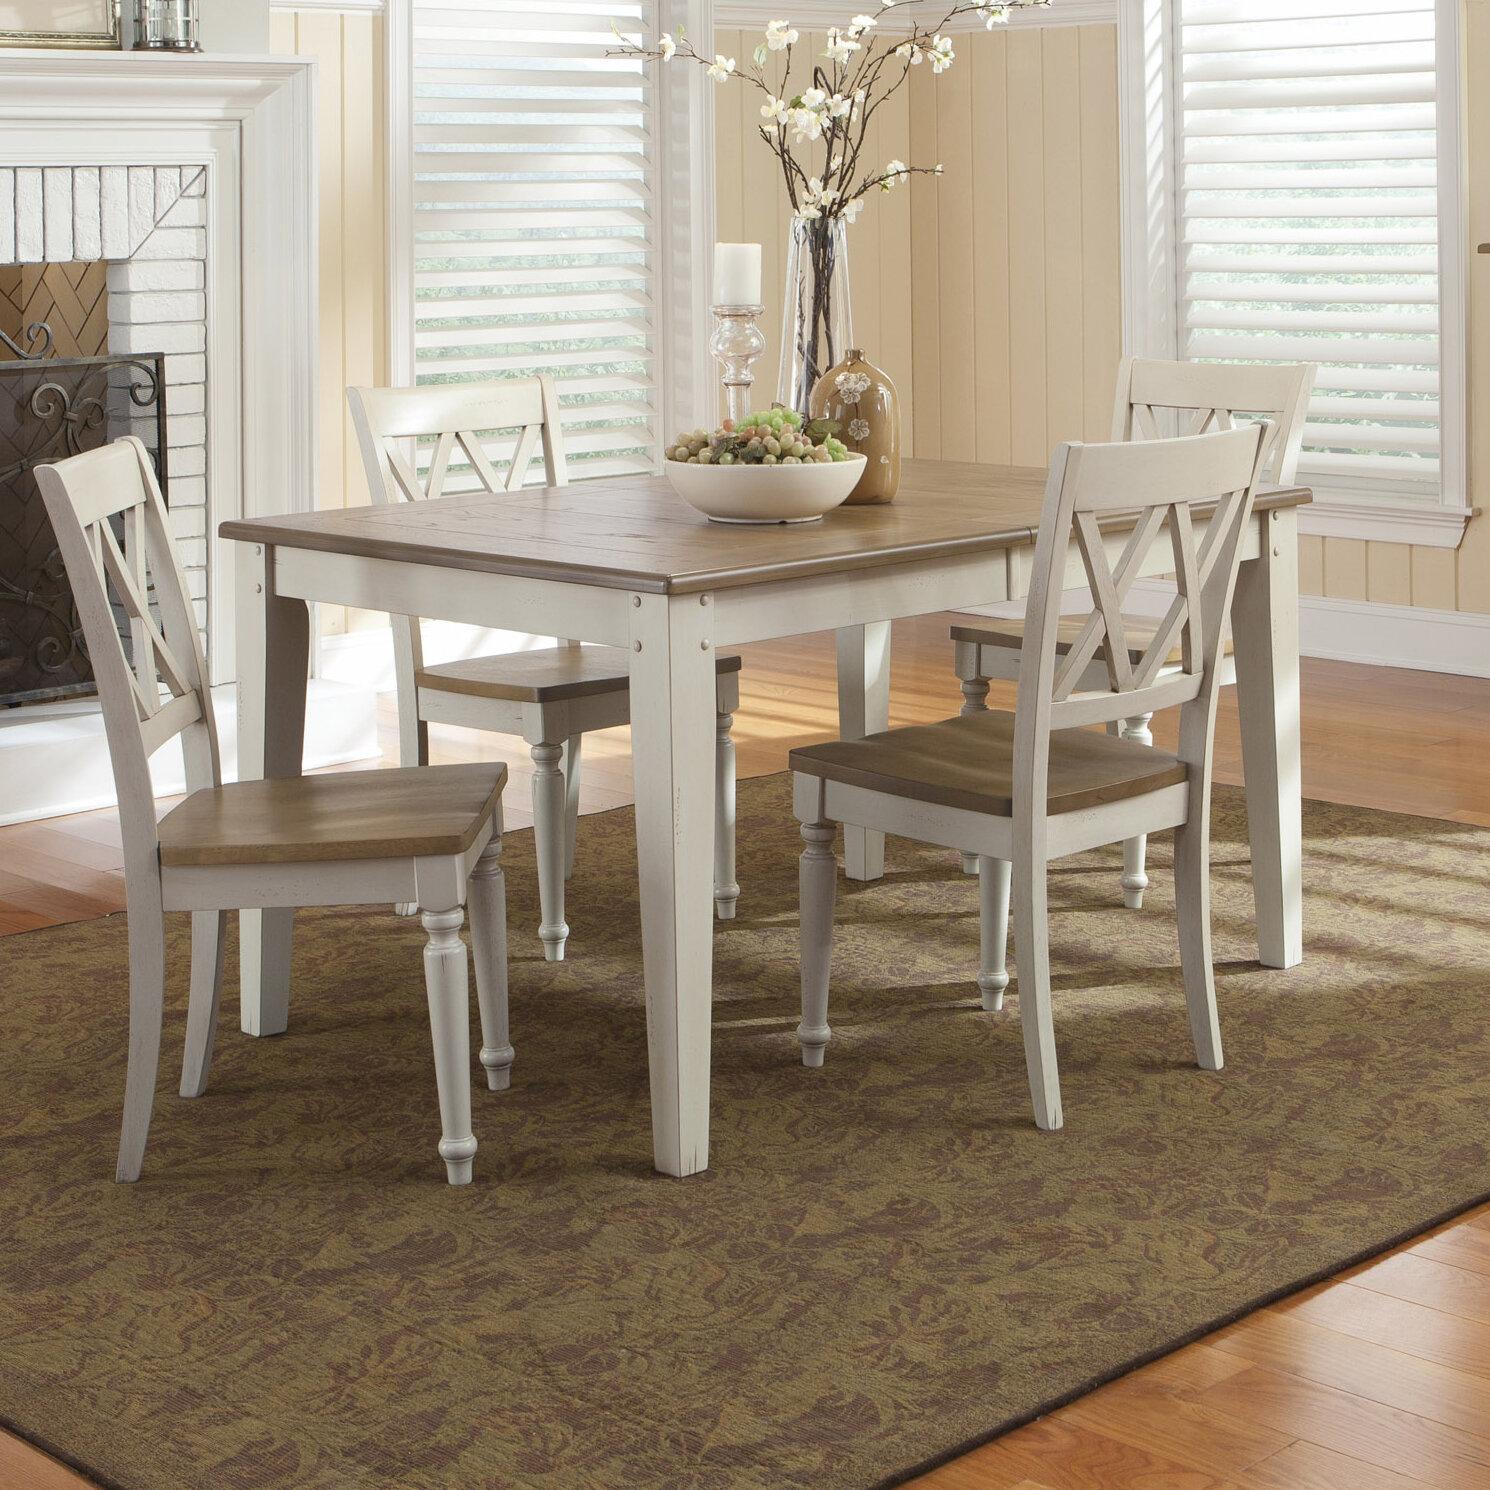 Extendable Dining Table Set Erigiestudio